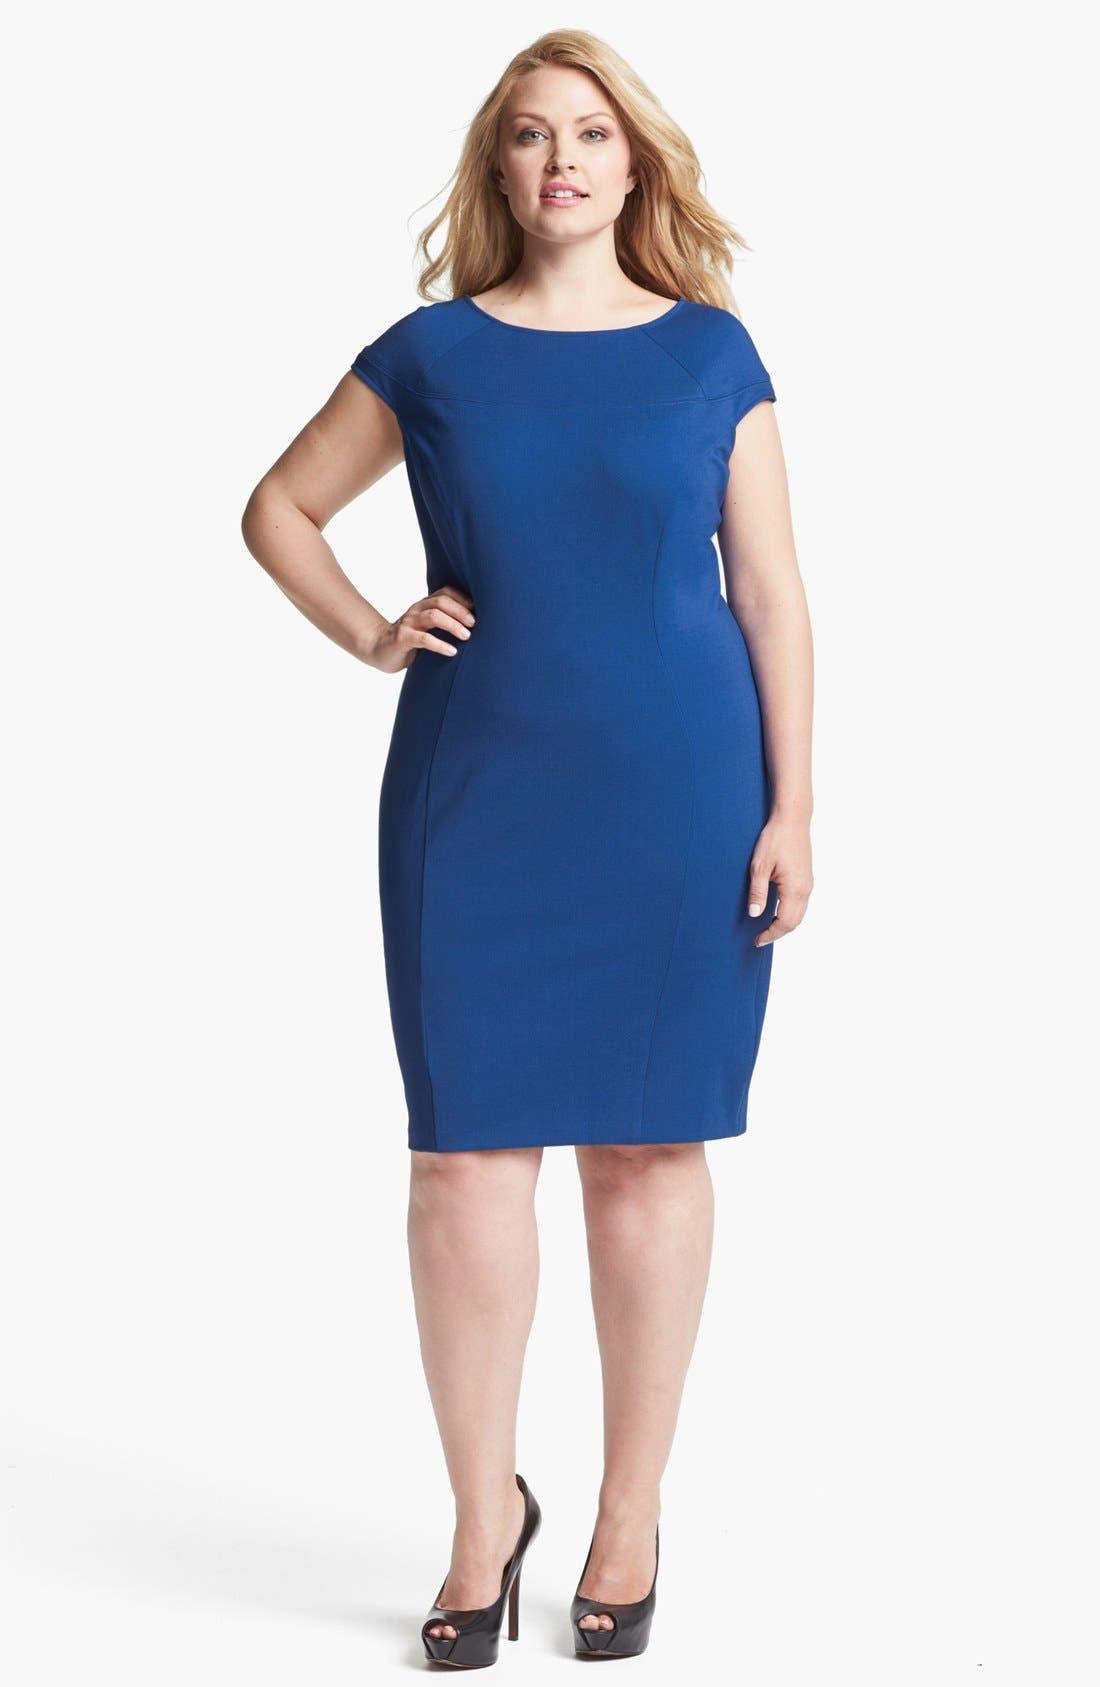 Main Image - ABS by Allen Schwartz Fitted Ponte Knit Dress (Plus Size)